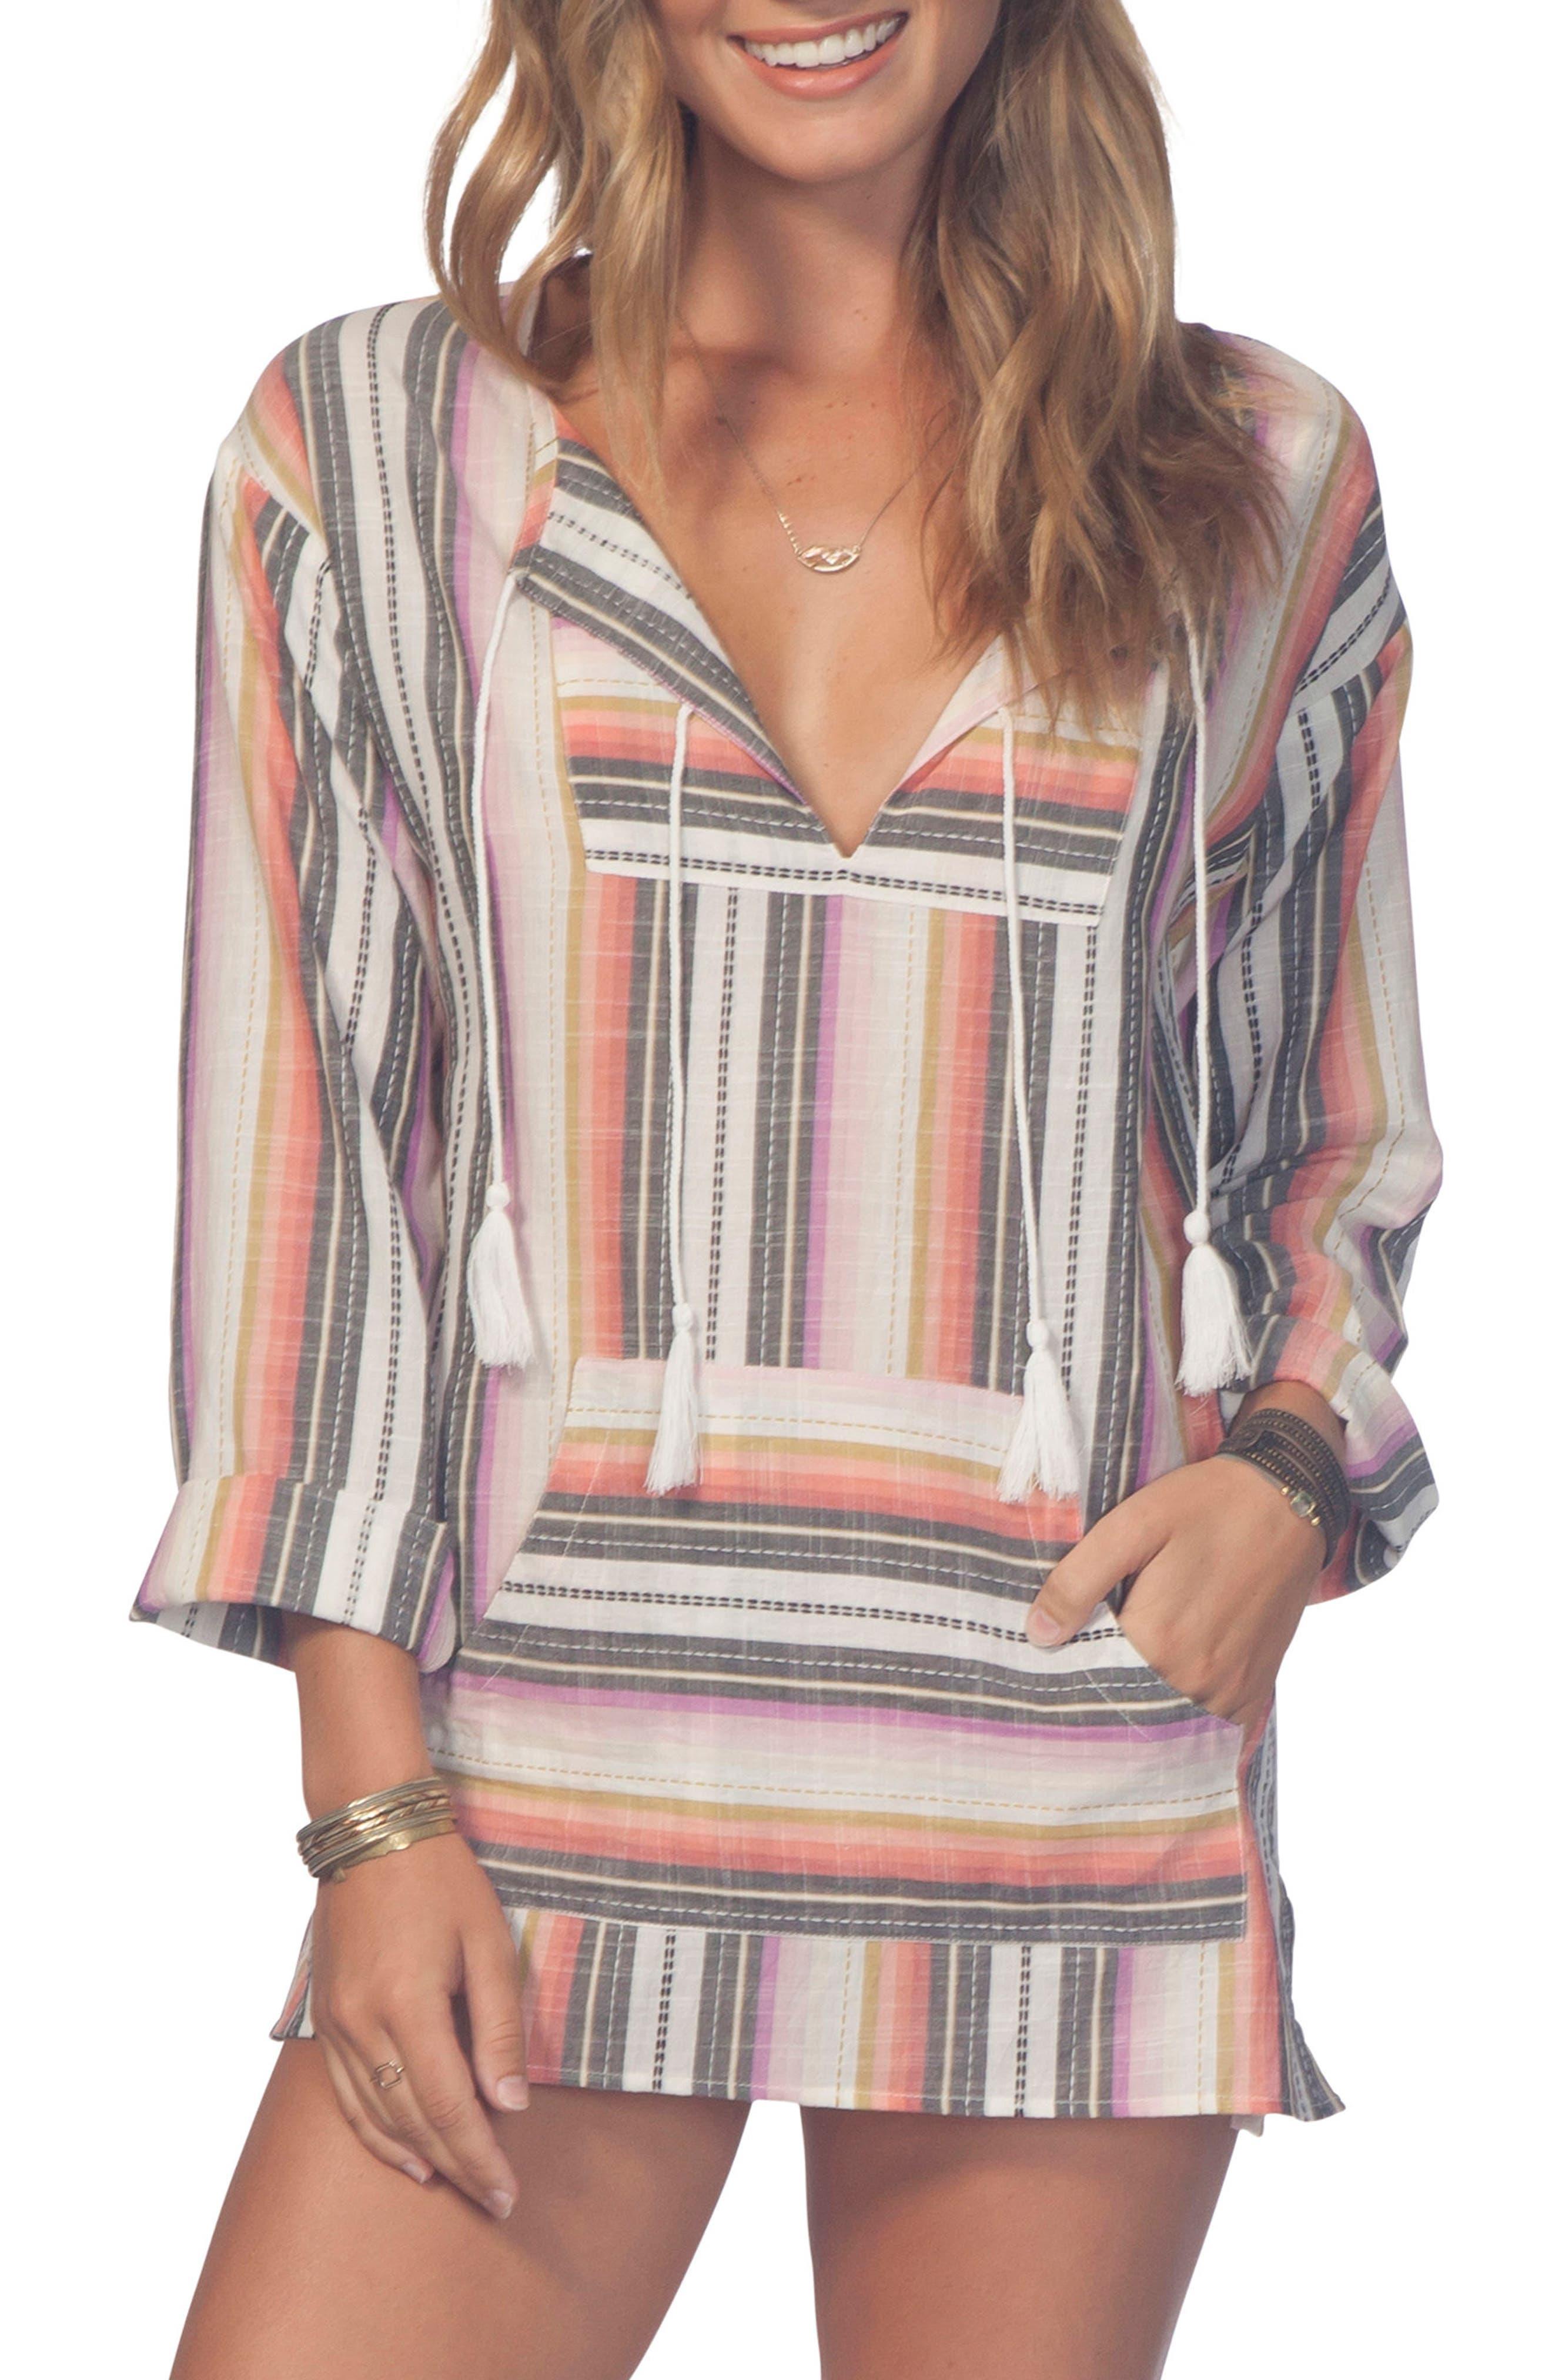 Sayulita Stripe Poncho Top,                         Main,                         color,